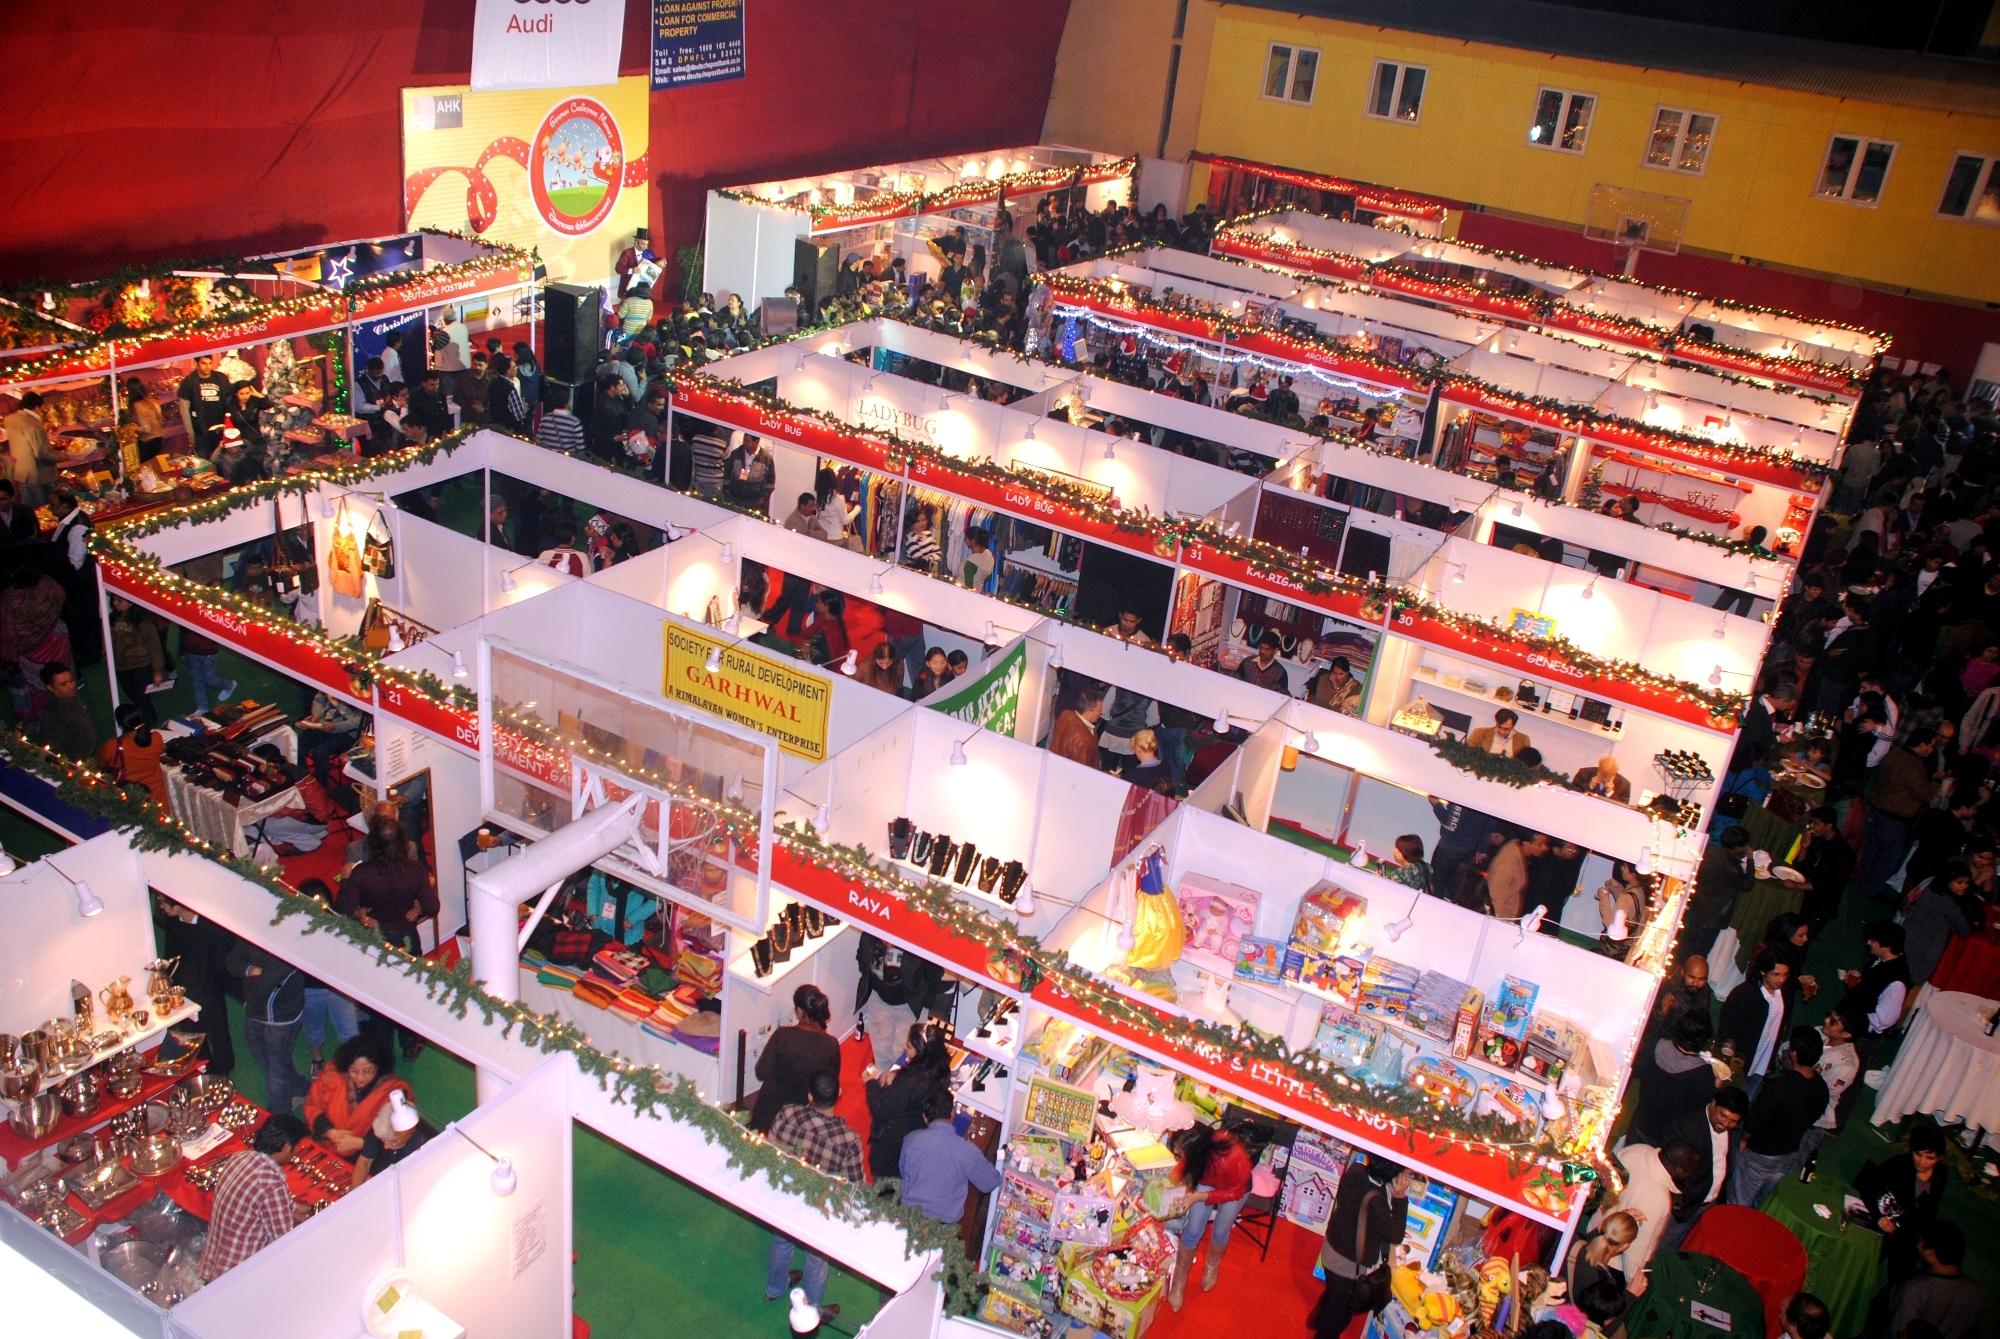 German Christmas Market Invites All To Celebrate The Festive Season ...